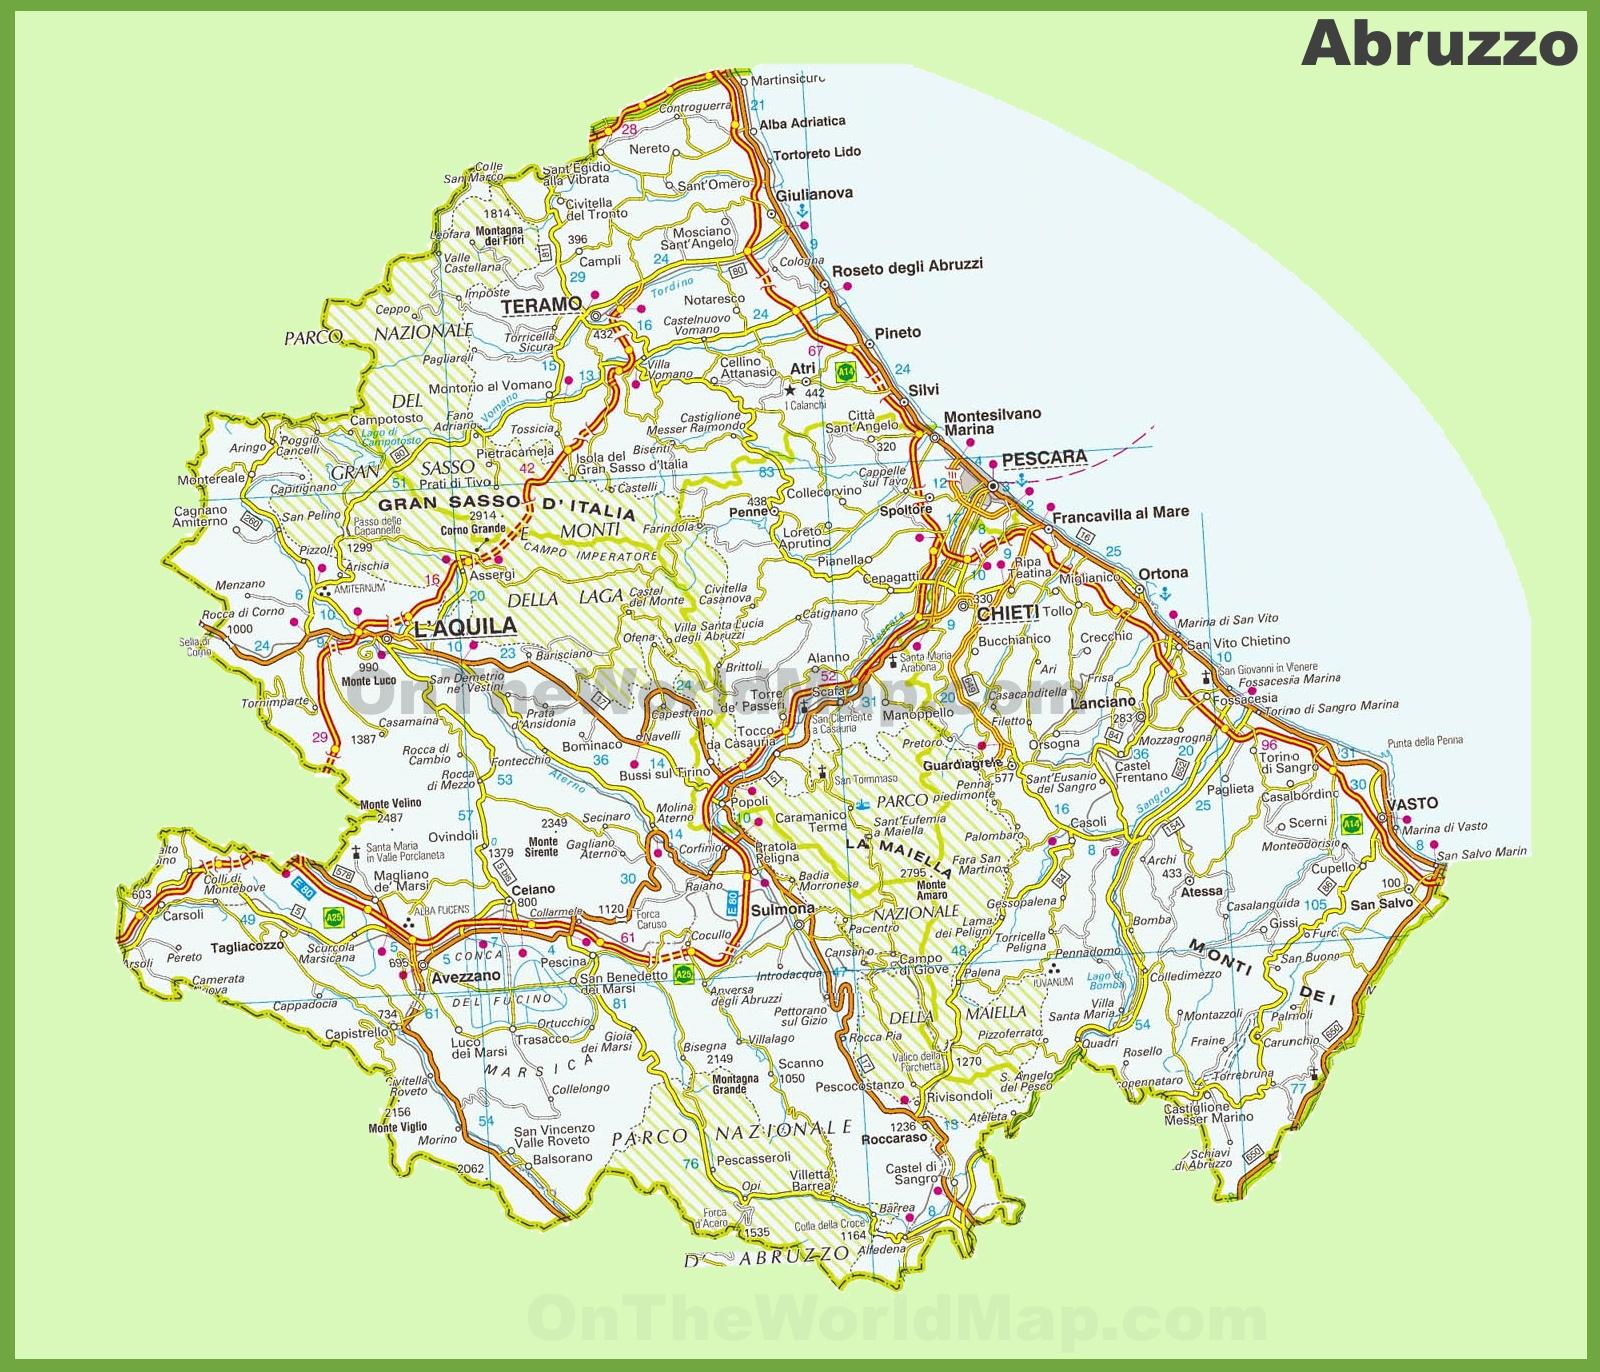 Abruzzo Maps Italy Maps of Abruzzo